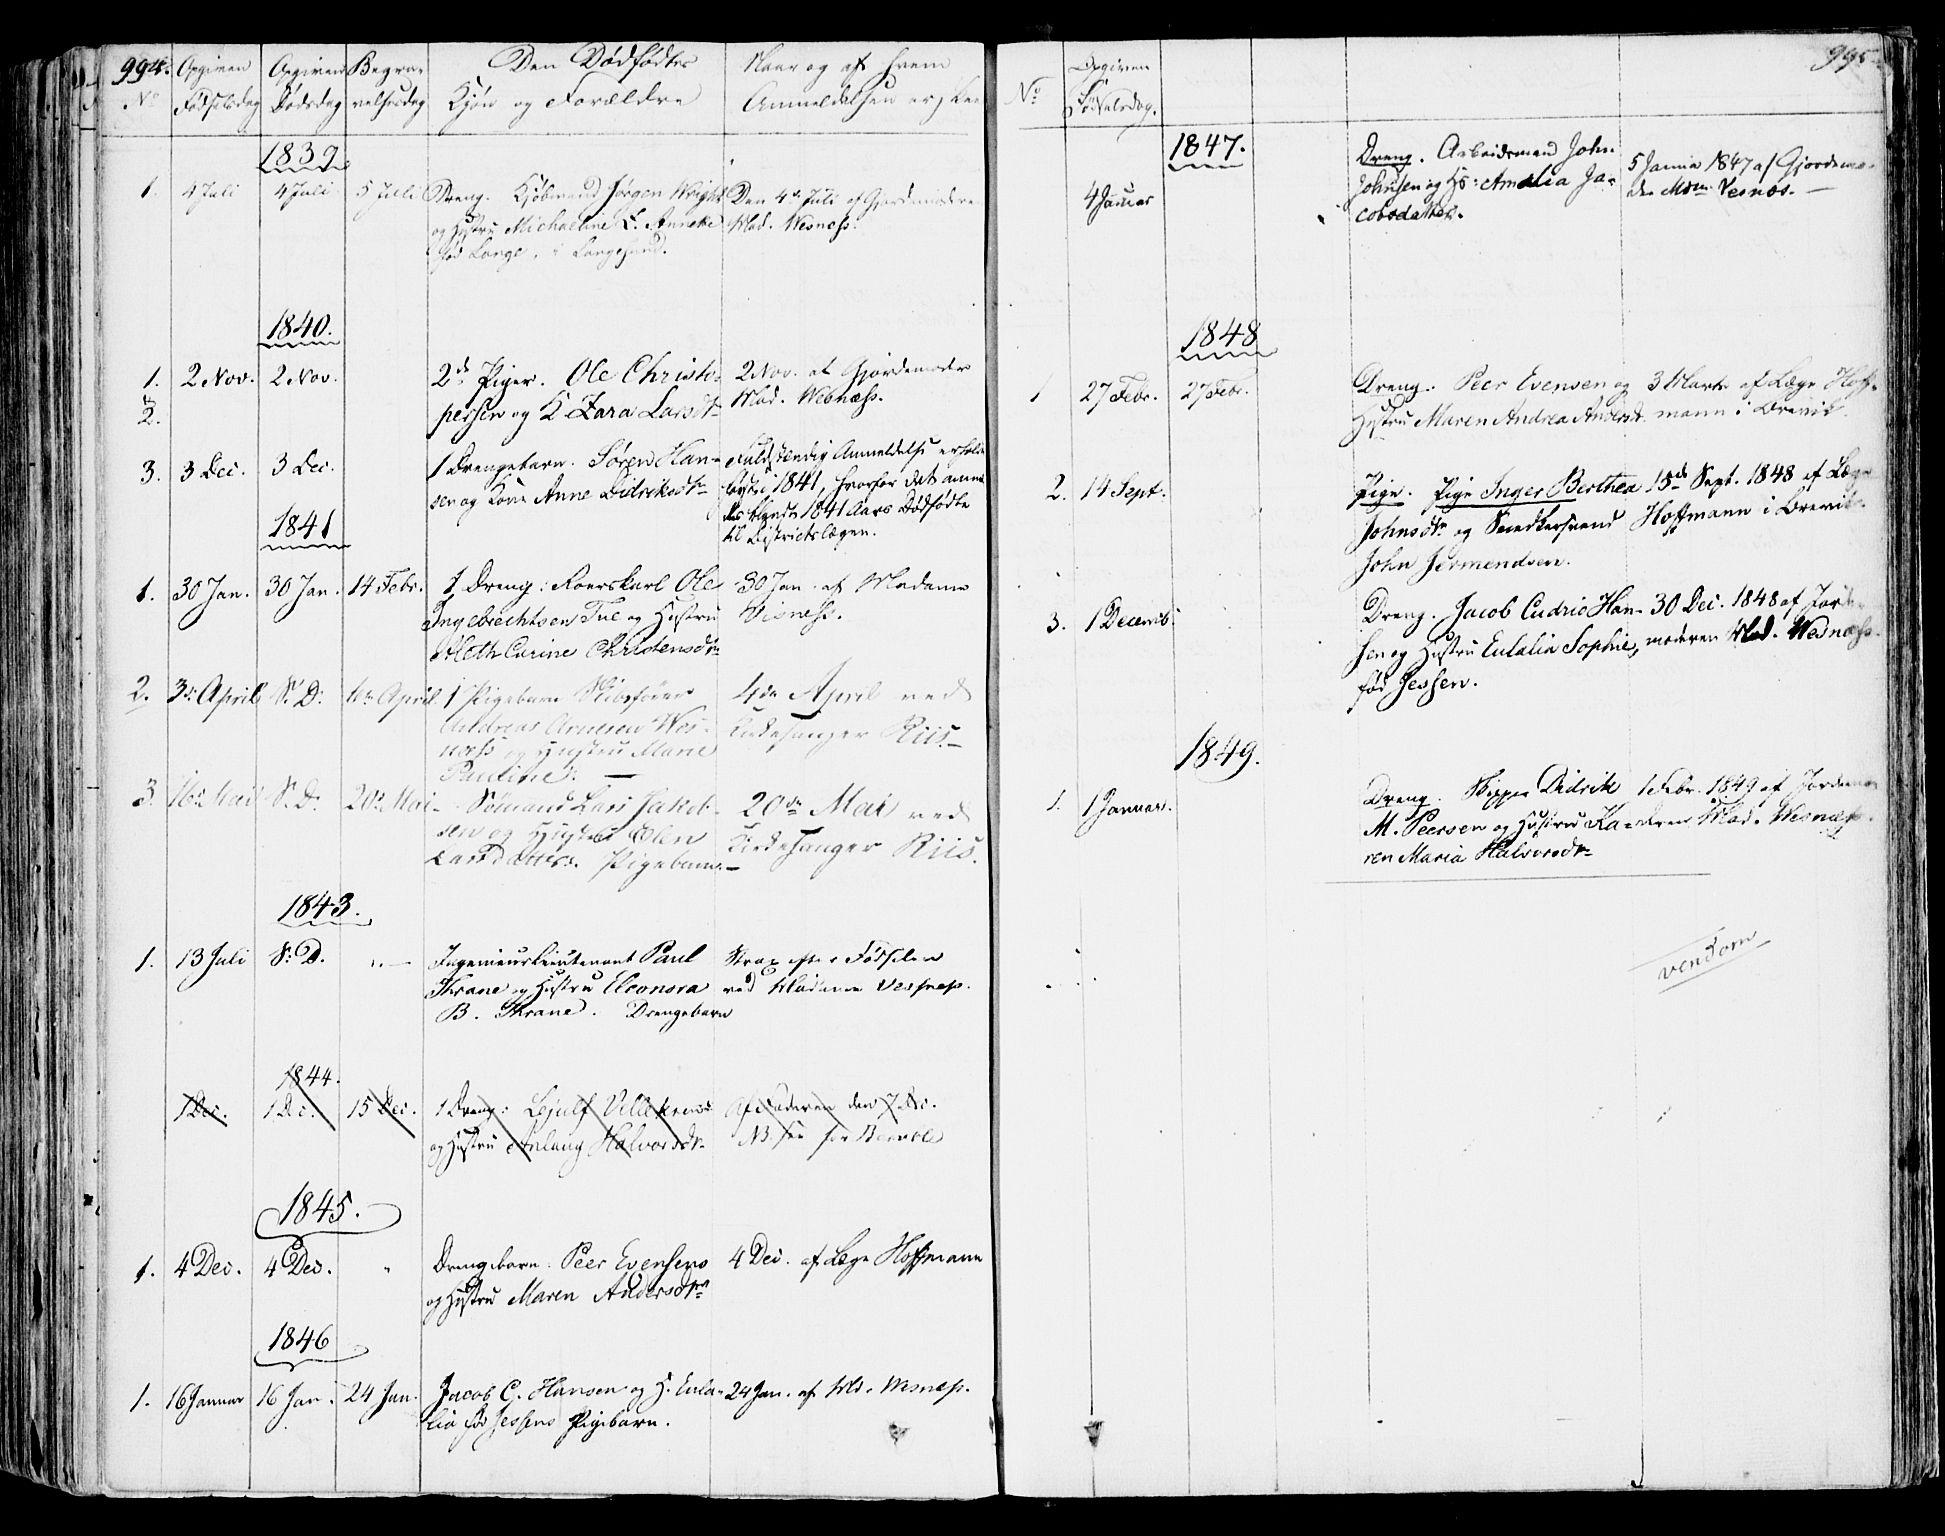 SAKO, Bamble kirkebøker, F/Fa/L0004: Ministerialbok nr. I 4, 1834-1853, s. 994-995